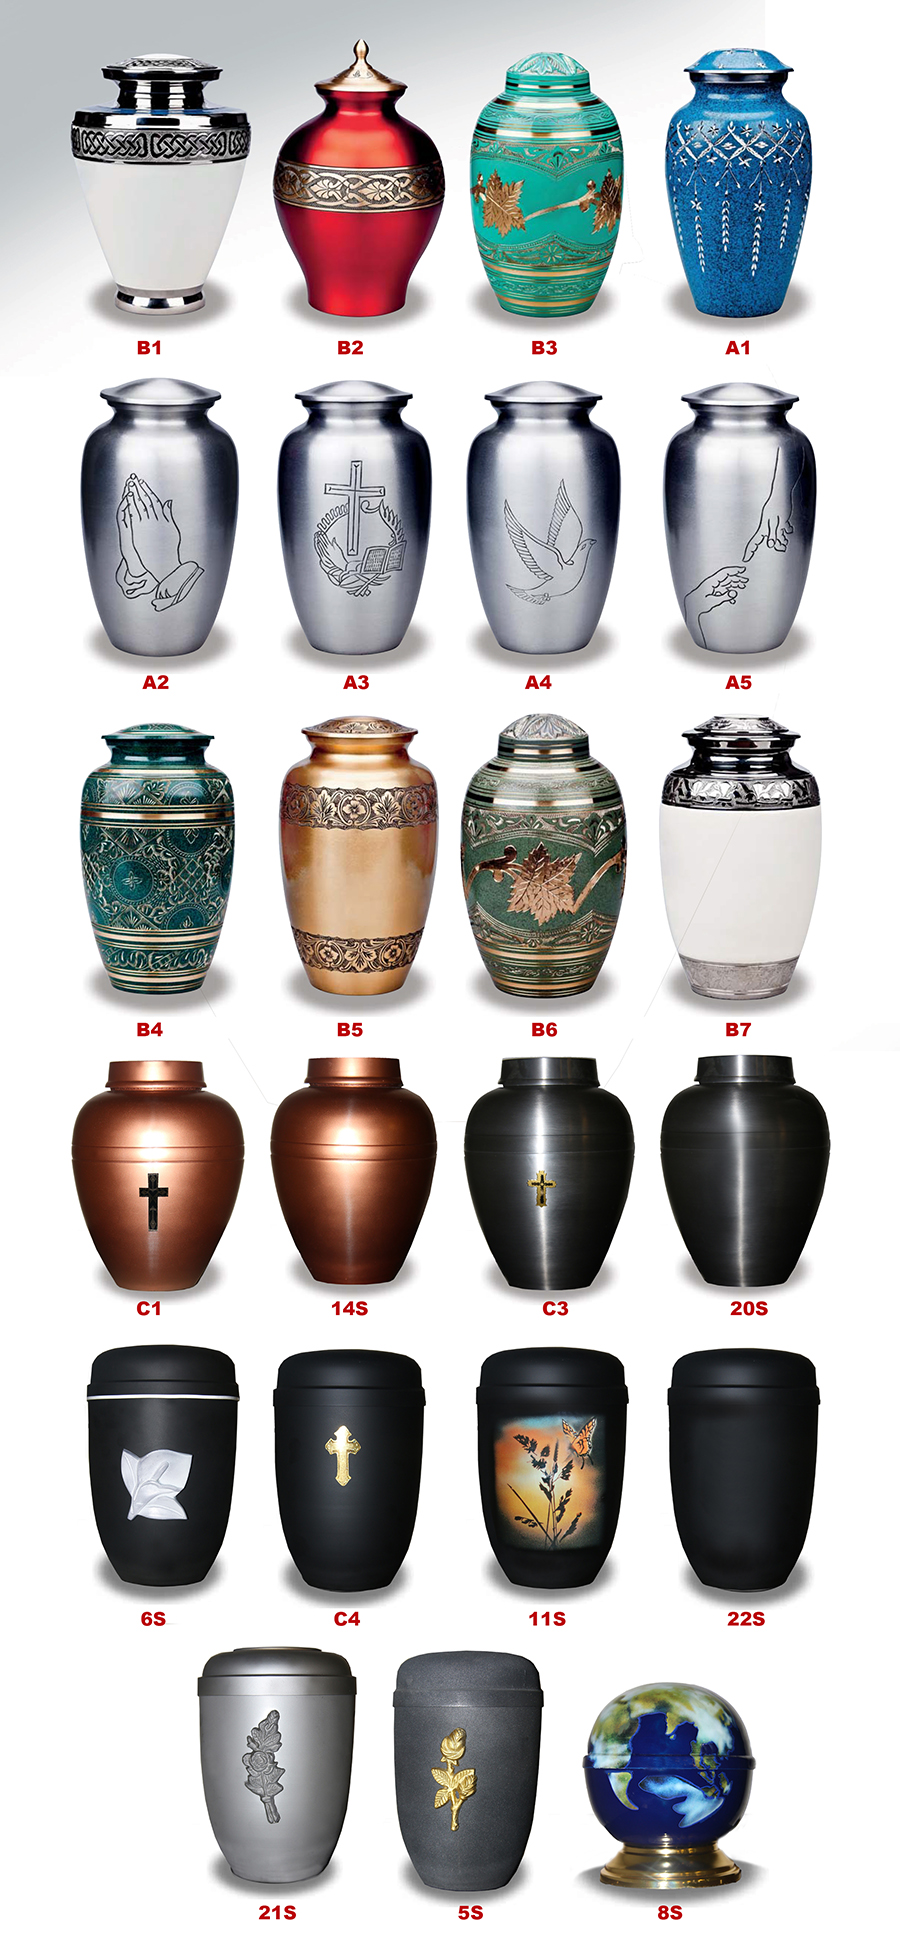 Walicki 2014 02 urny projekt 3.indd